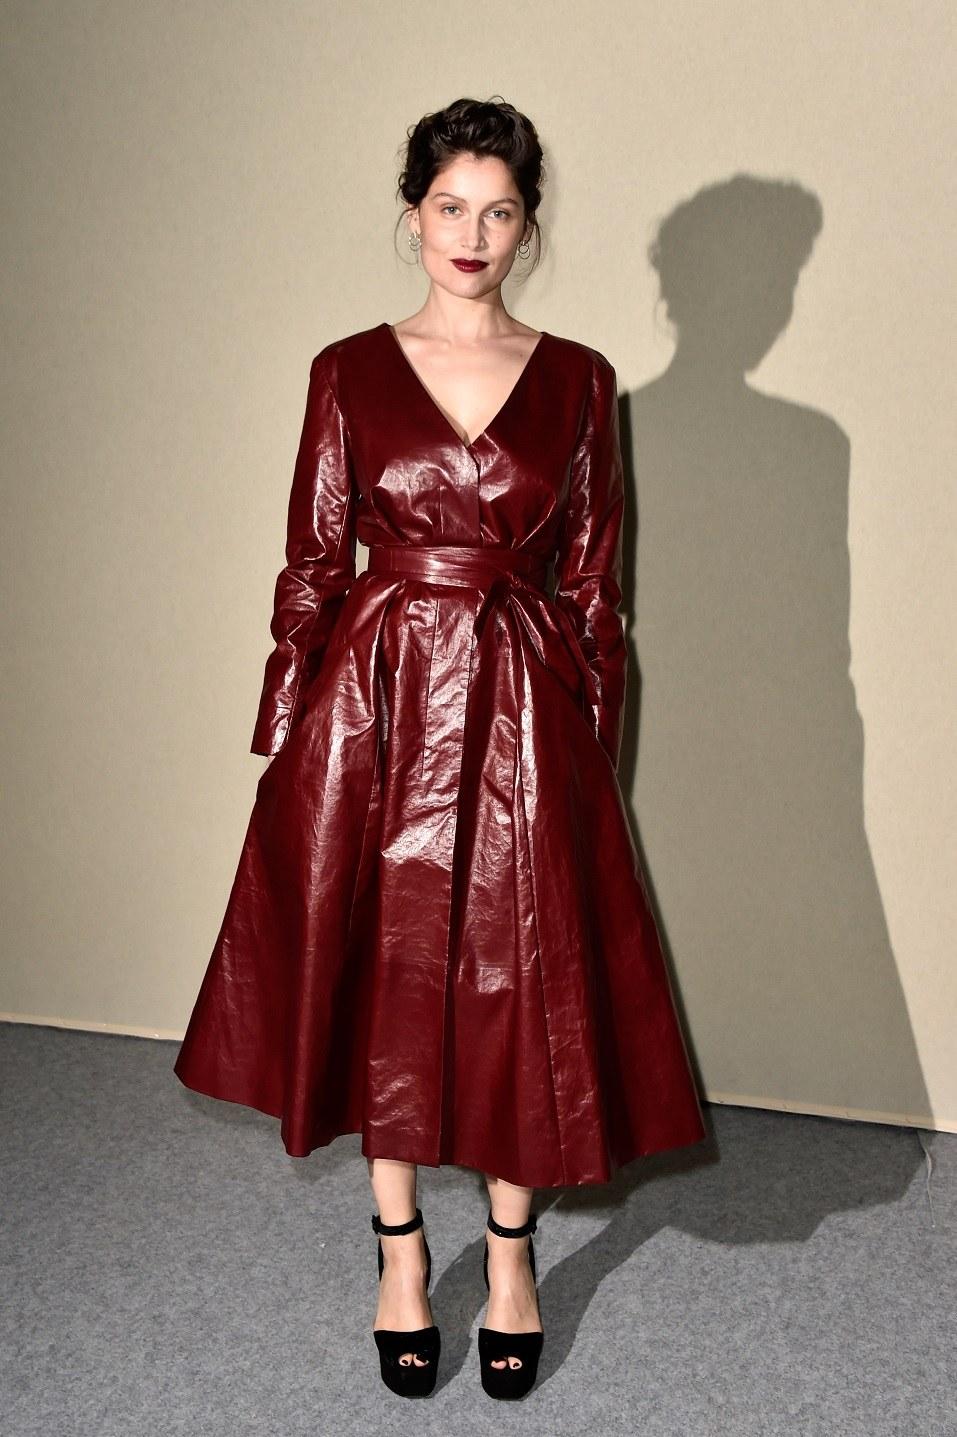 Laetitia Casta attends the Nina Ricci show as part of the Paris Fashion Week